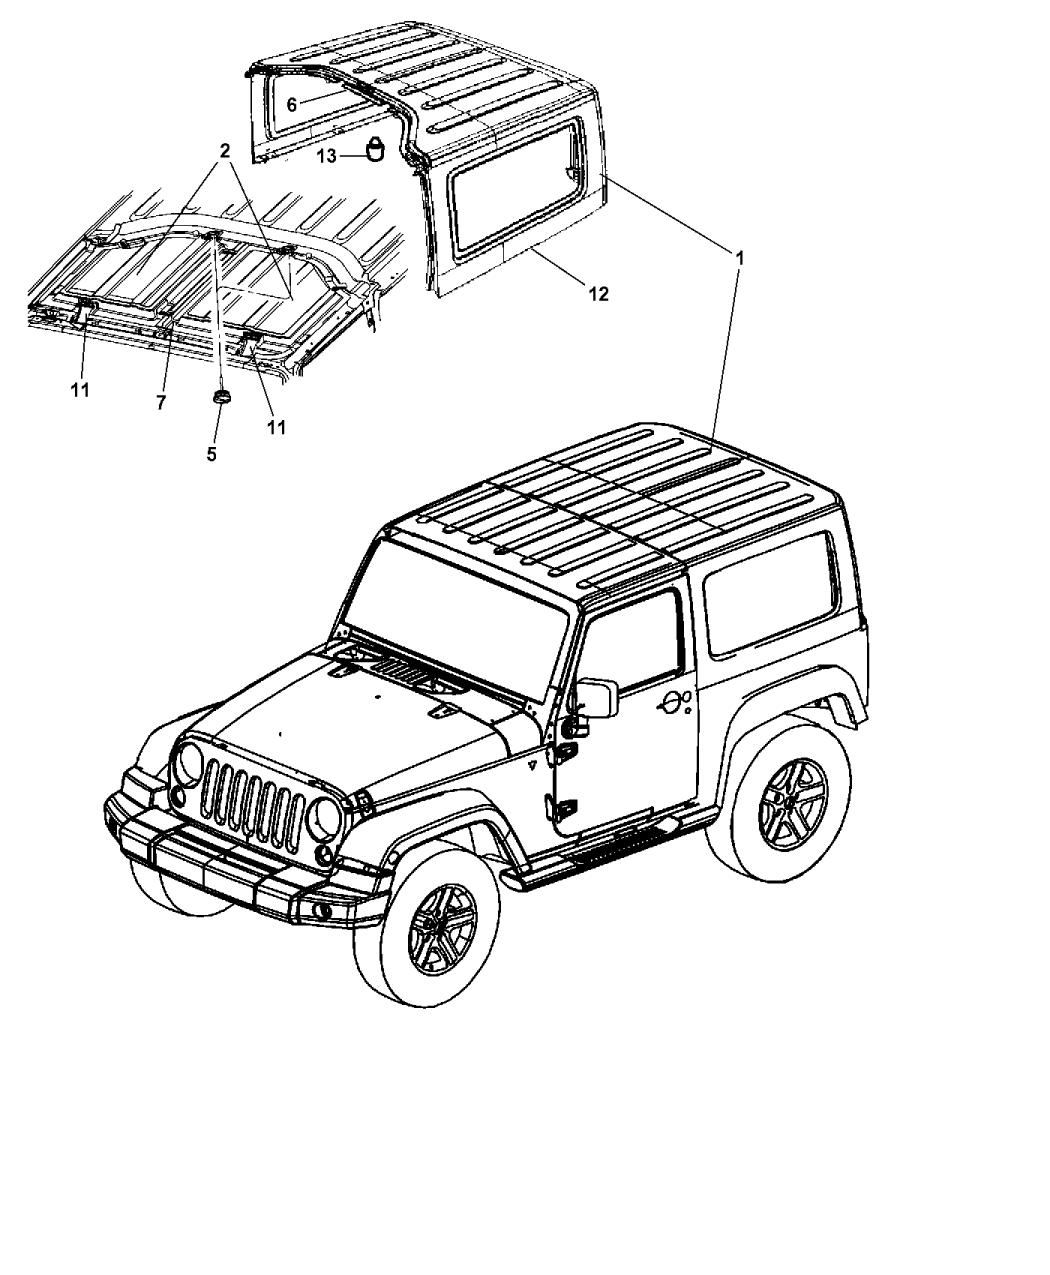 1pj03rxfaj genuine jeep top. Black Bedroom Furniture Sets. Home Design Ideas